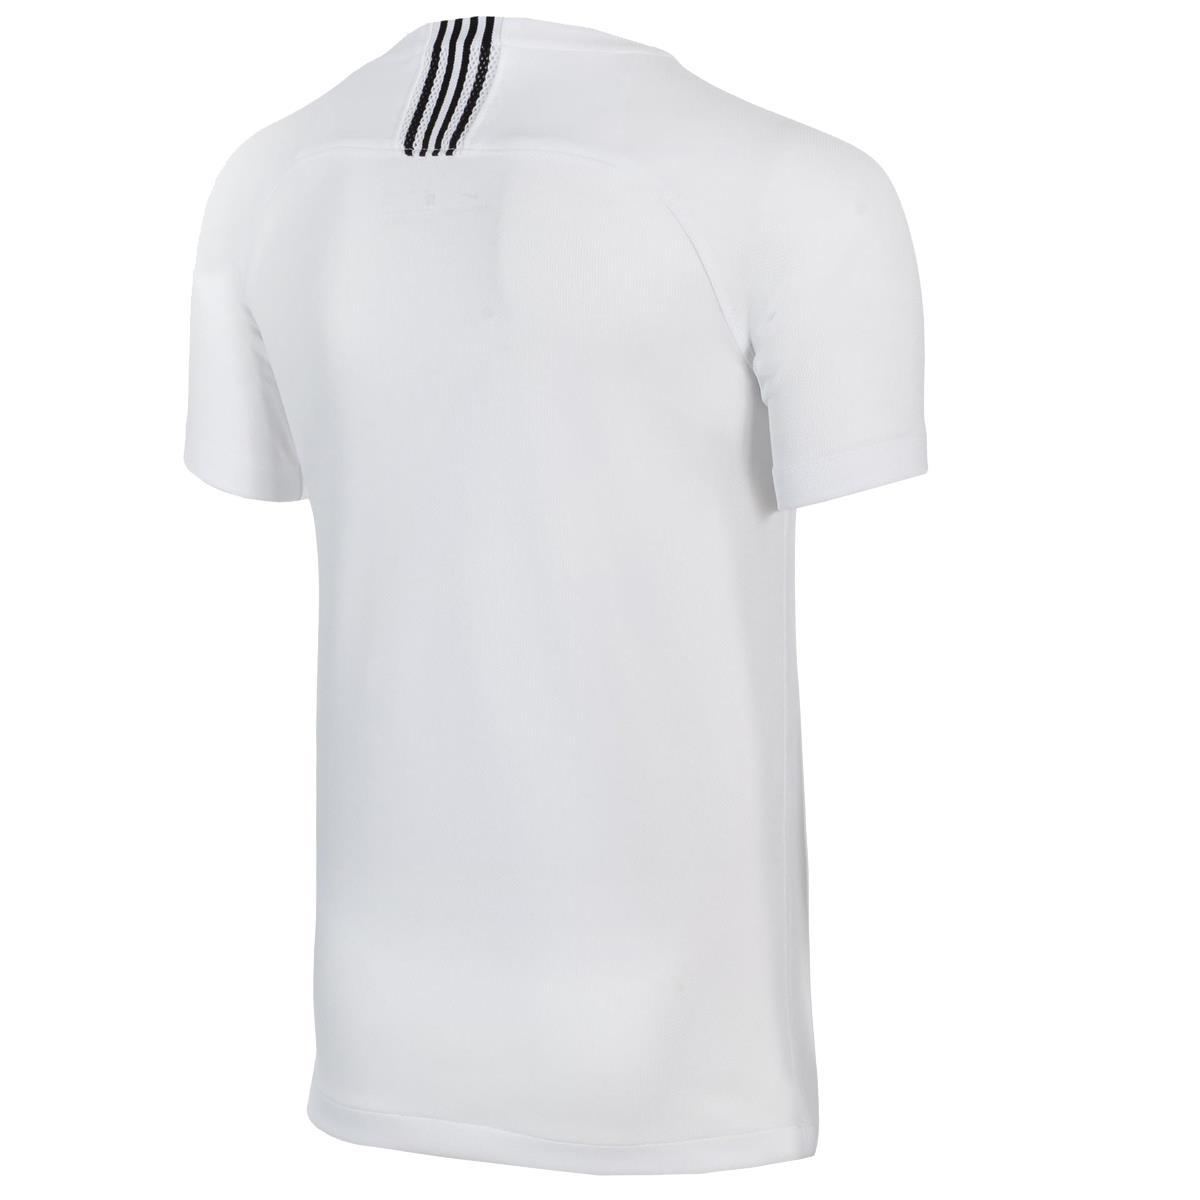 Camisa Nike Corinthians 2018 19 Torcedor Infantil c536c2809a05f